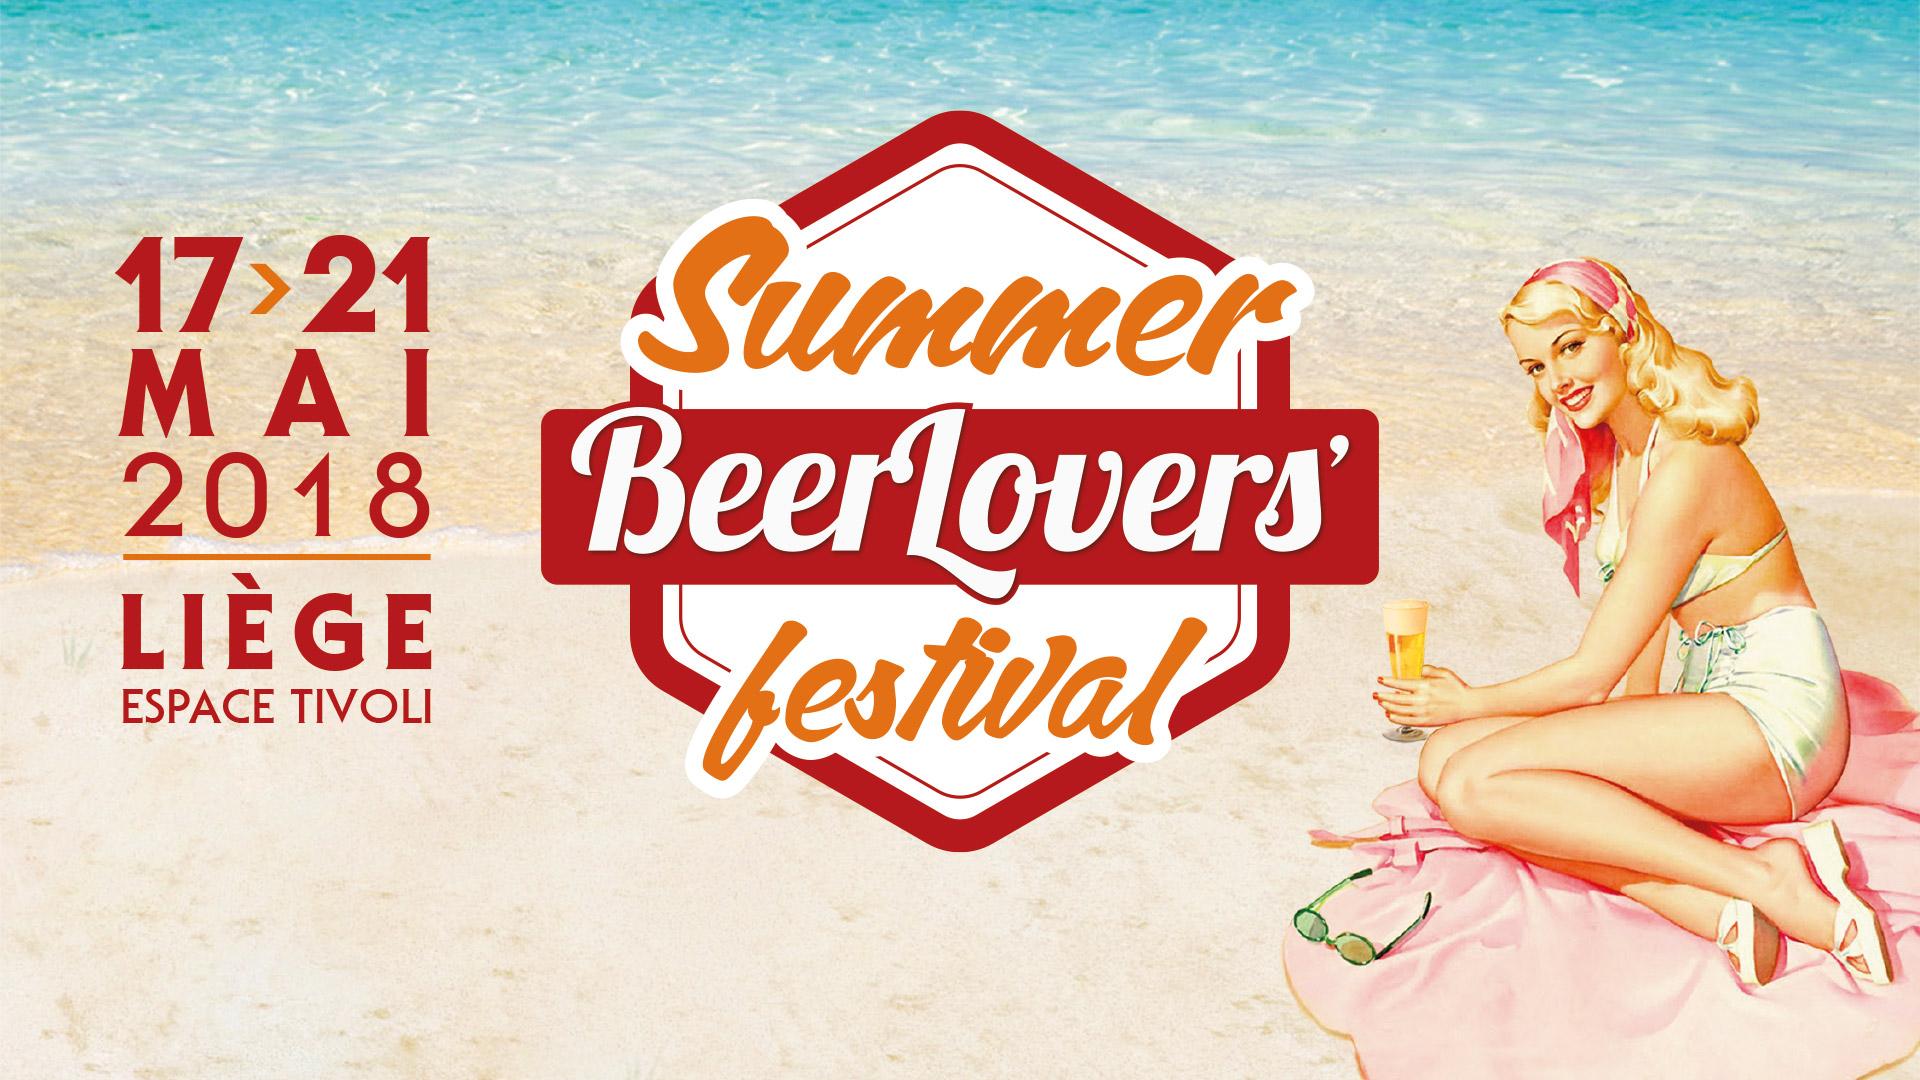 Summer Beer Lover' Festival 2018